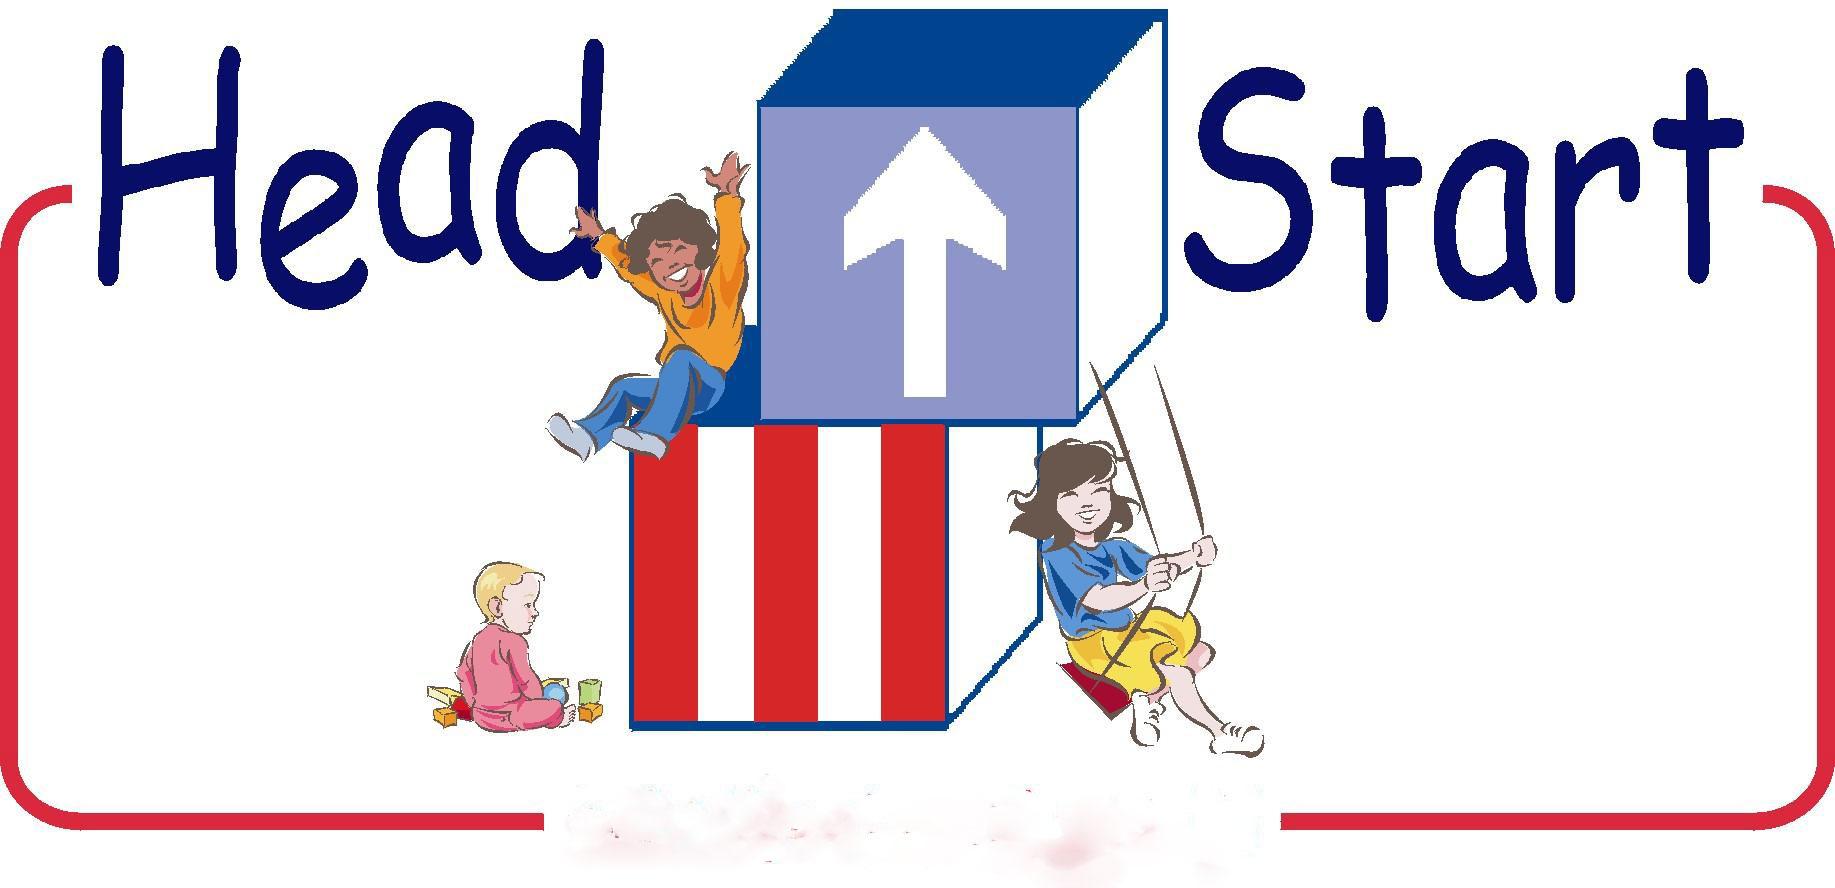 Free School Cliparts Trim Download Free Clip Art Free Clip Art On Clipart Library